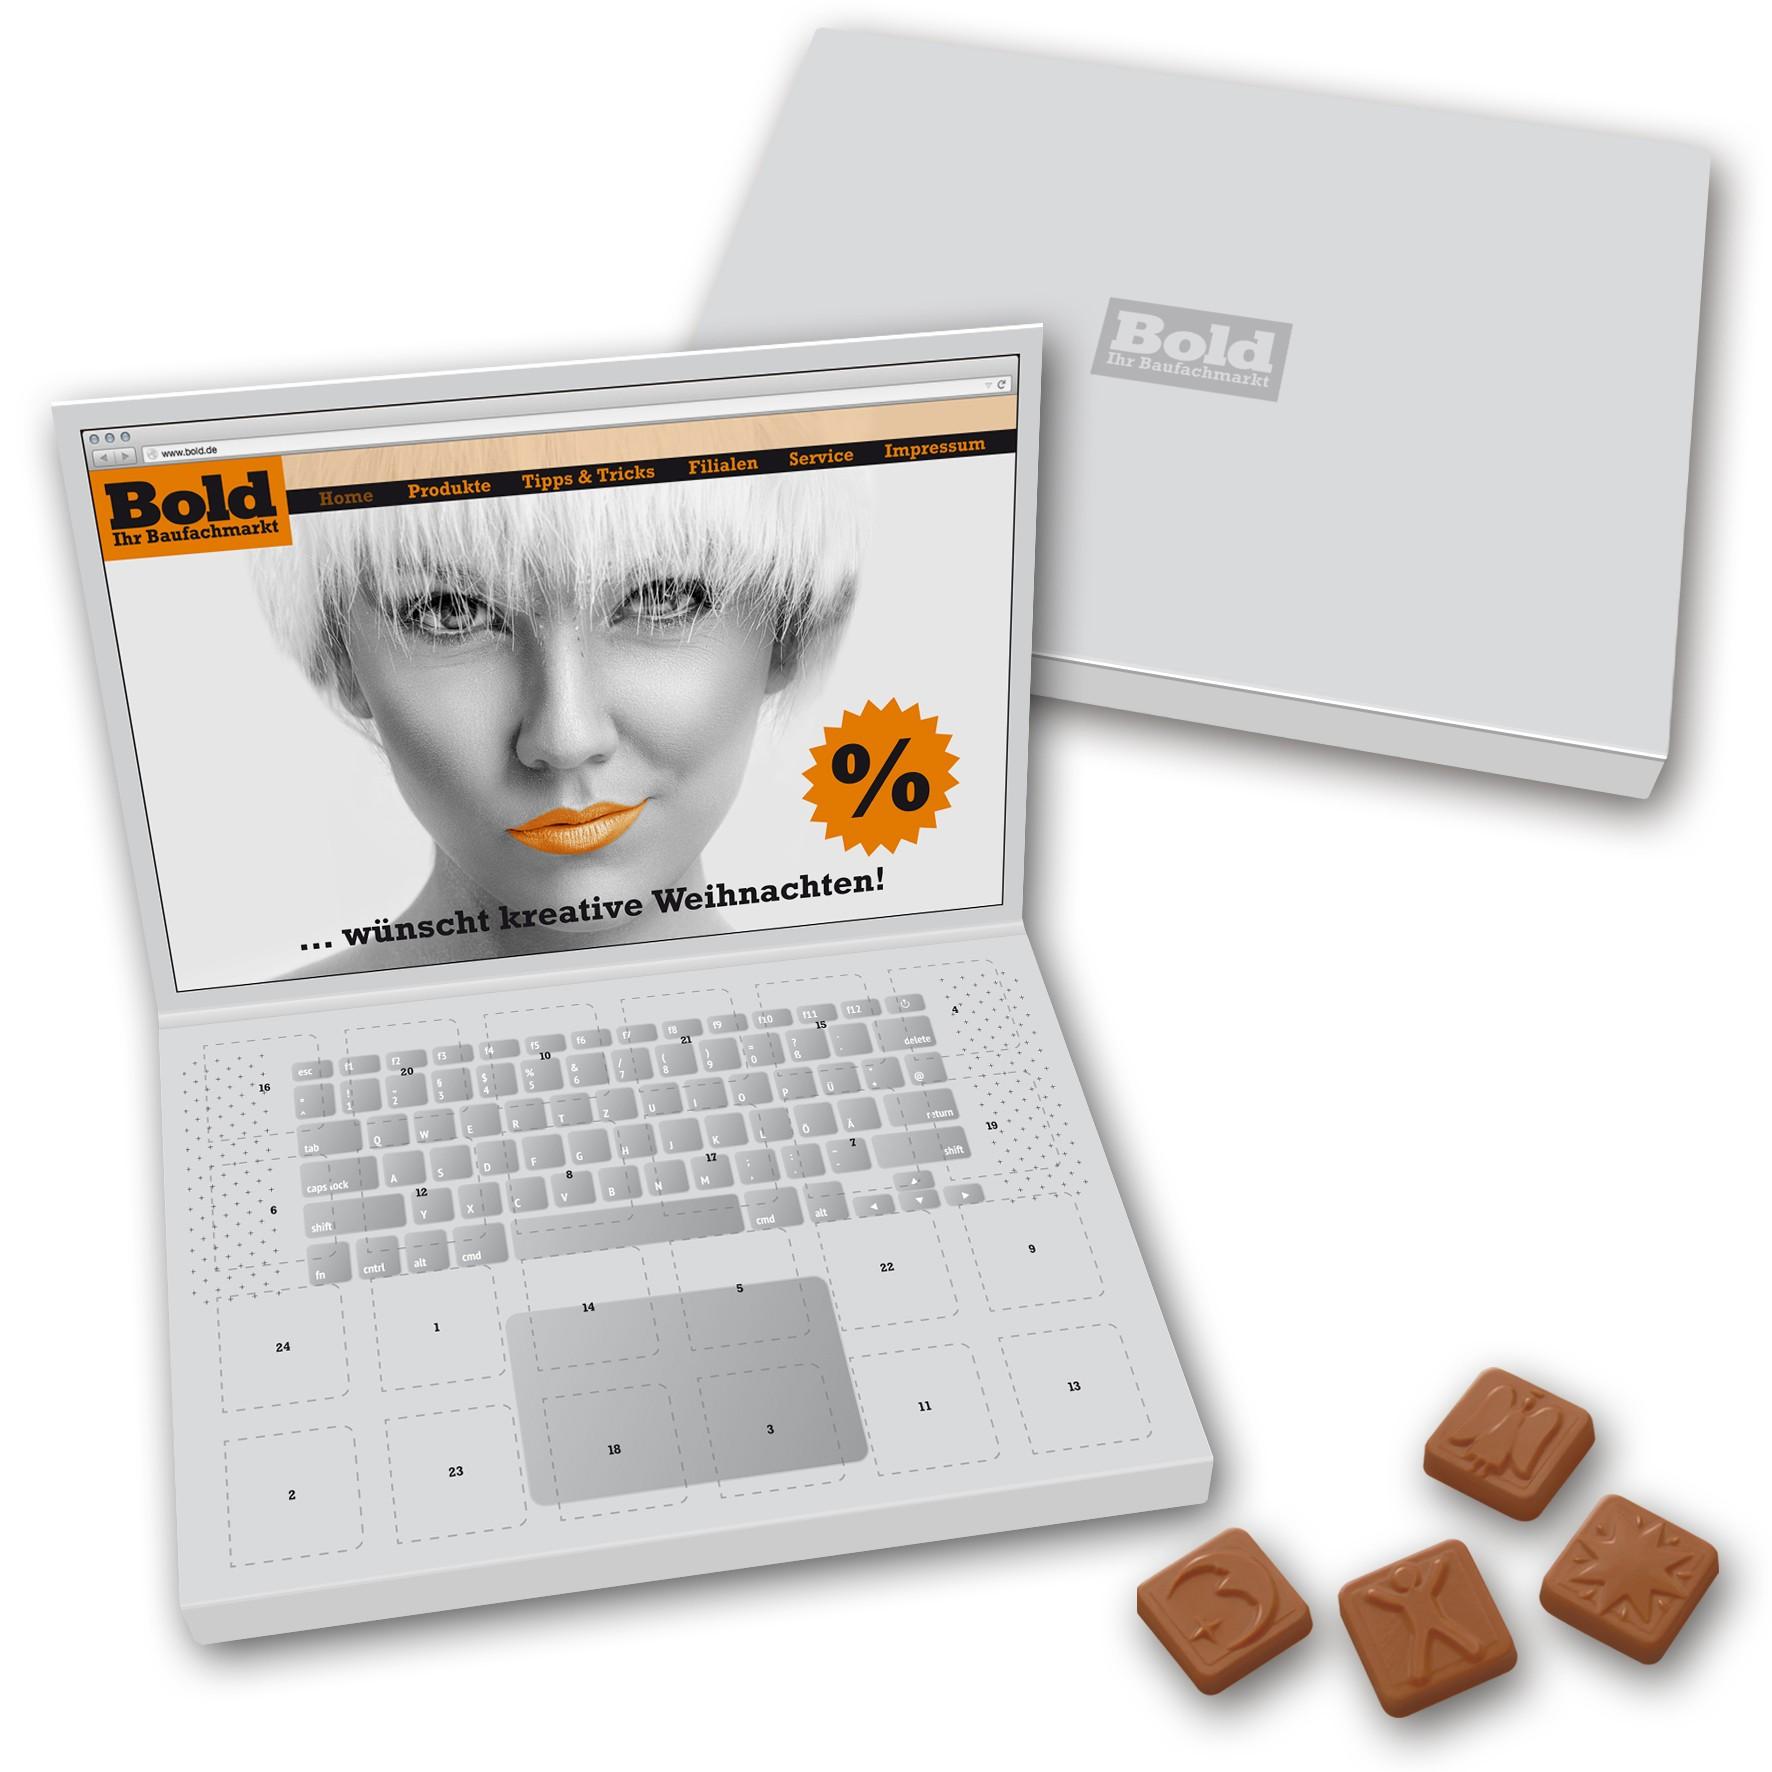 Adventskalender Laptop Großbriefformat